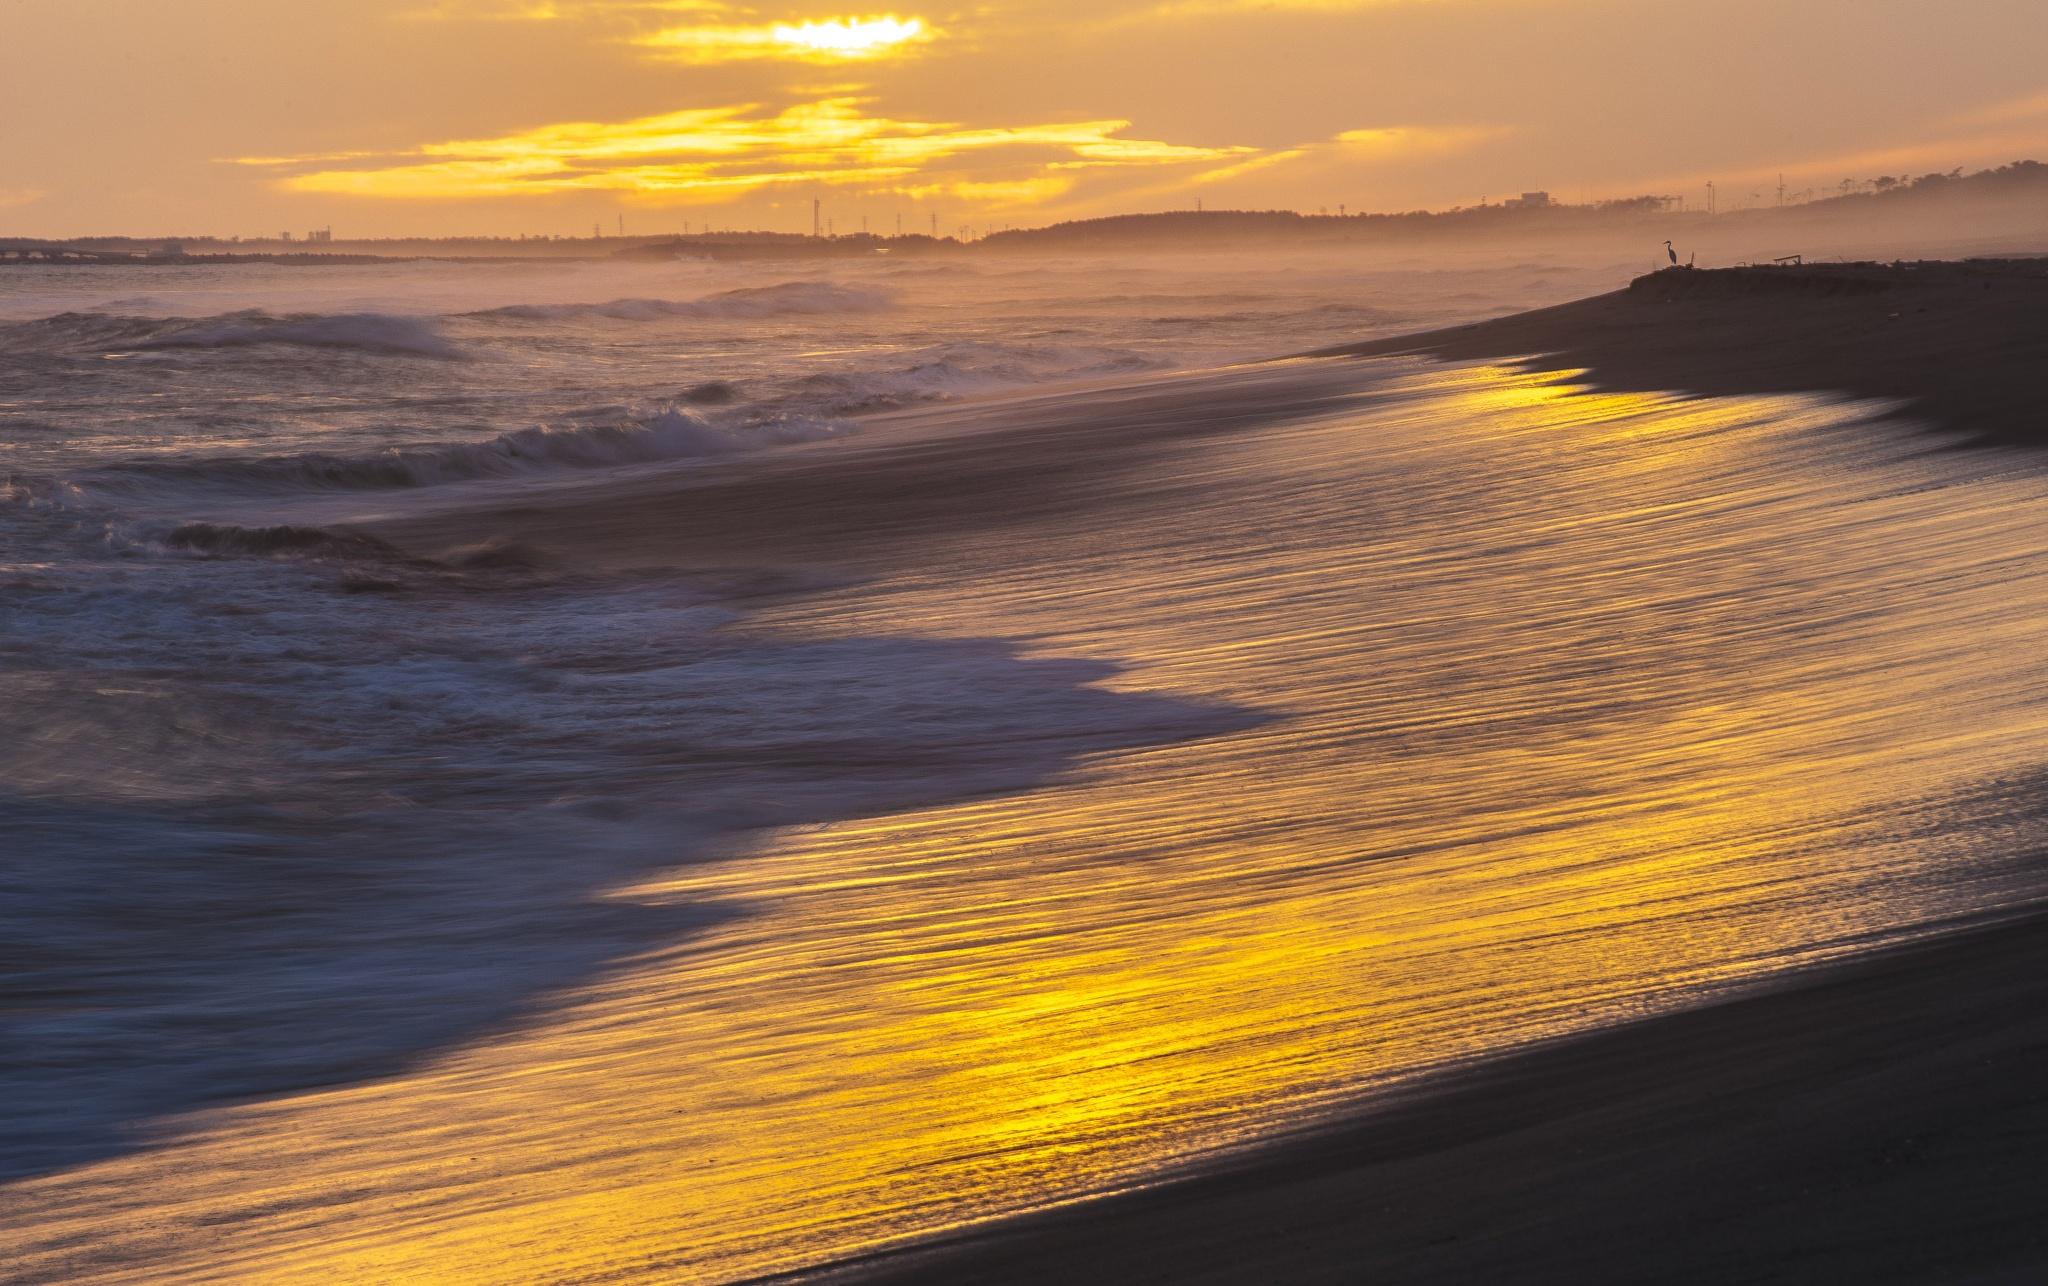 Sunset beach by Shozo kudo